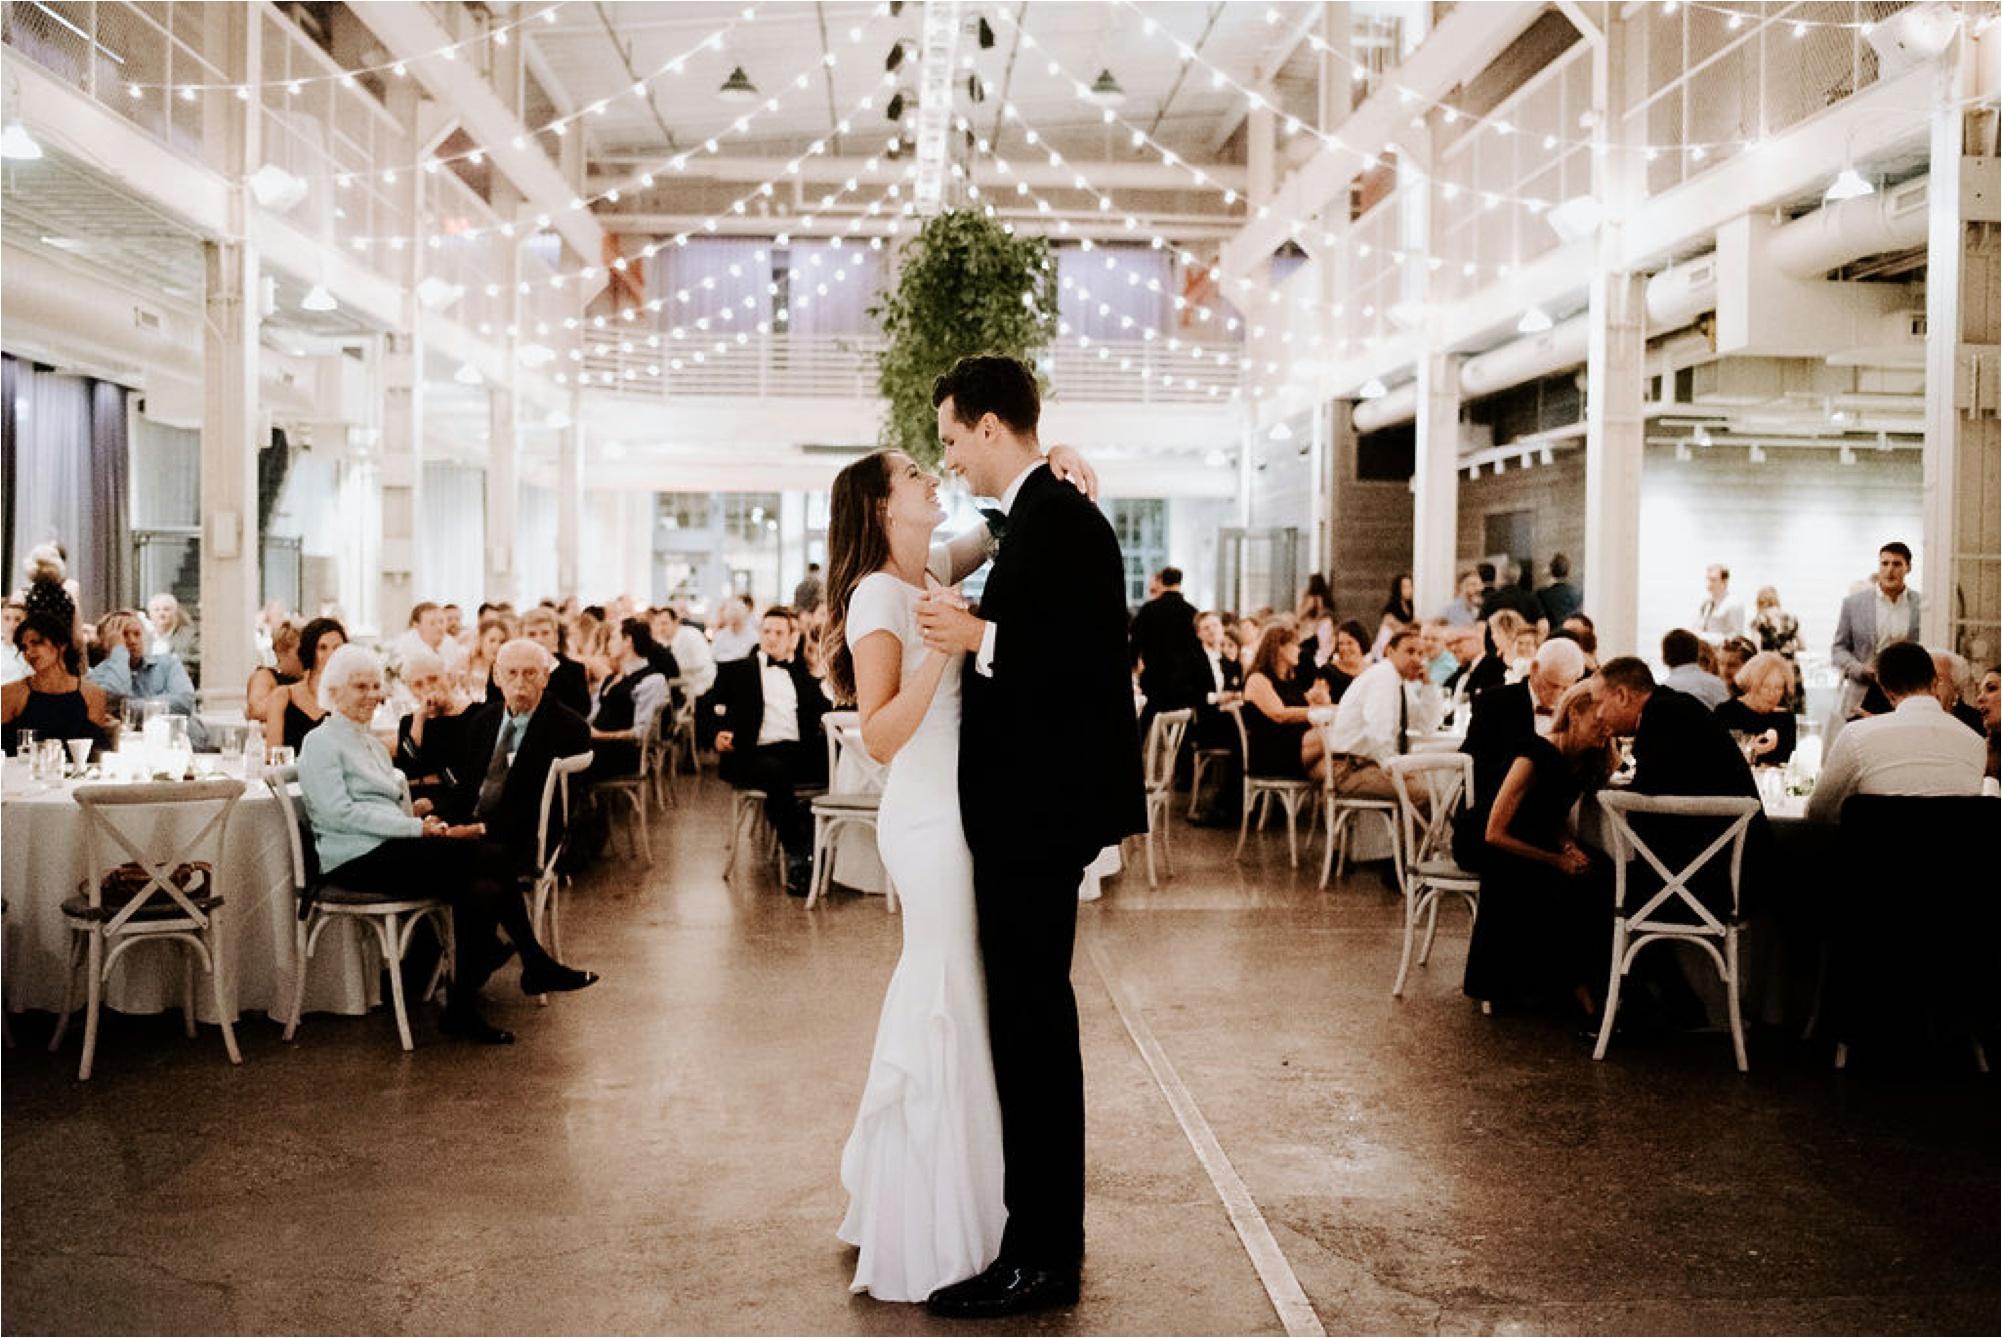 machine shop wedding minneapolis reception lighting first dance